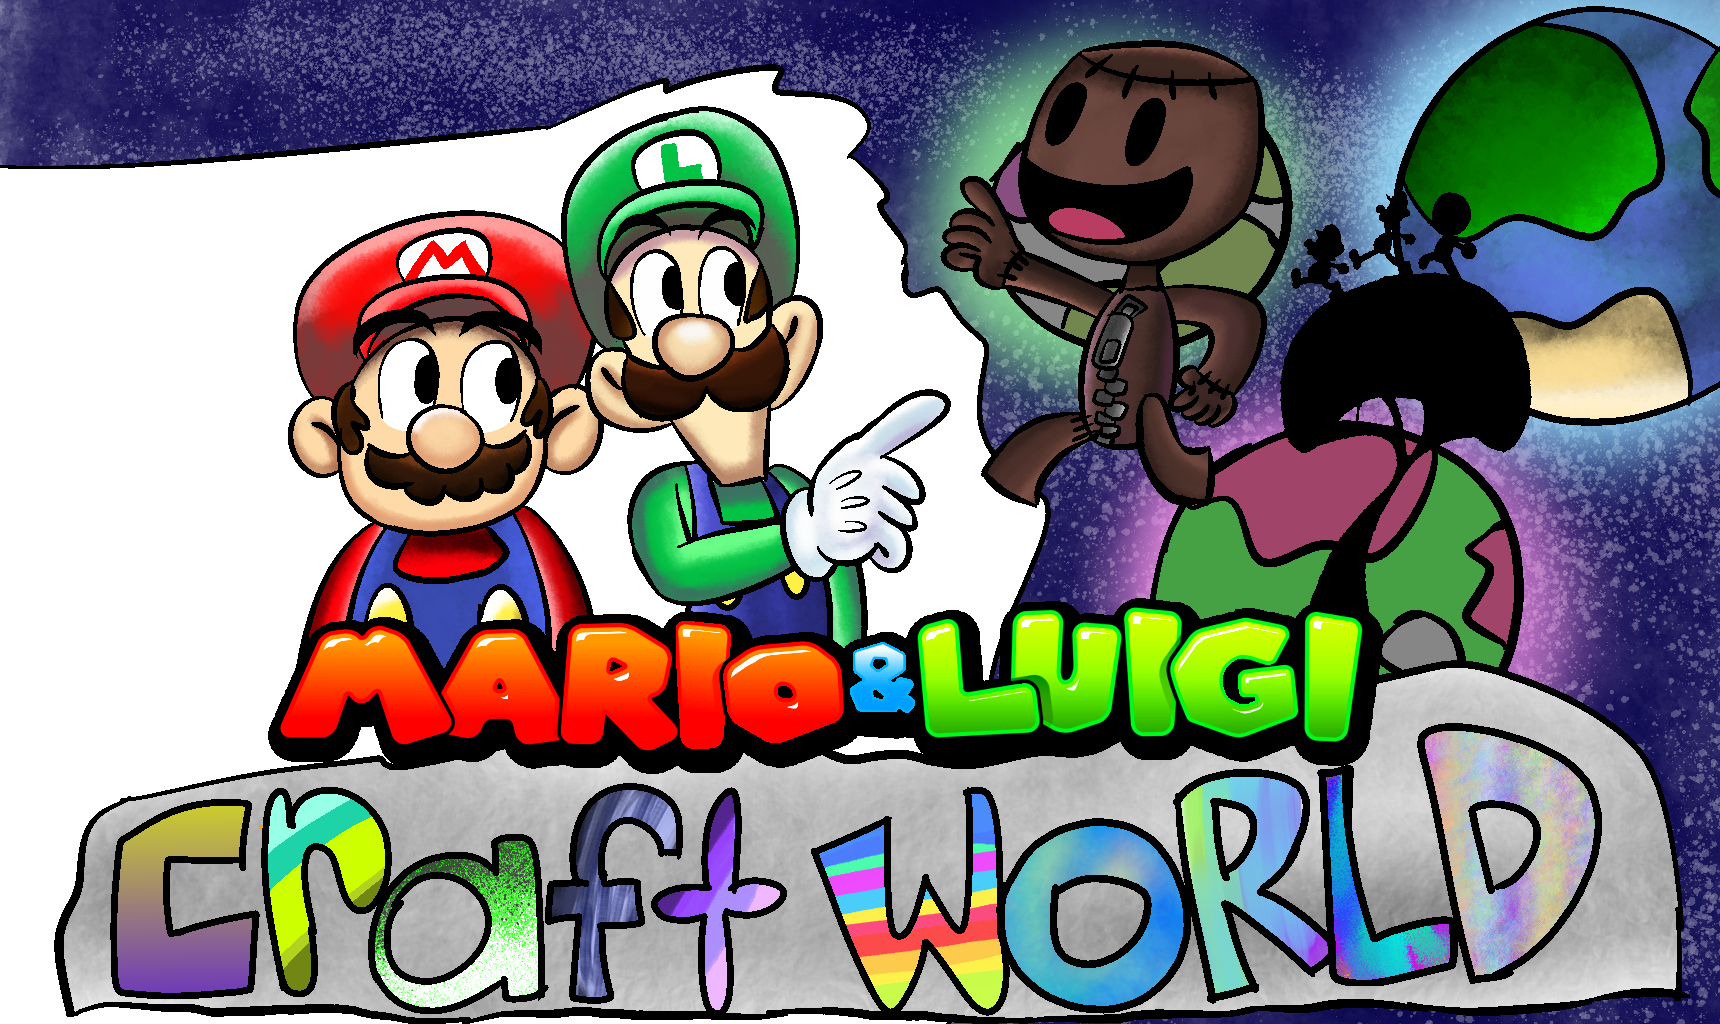 When the Mario Bros. enter the imaginesphere in Sackboy's homeworld.